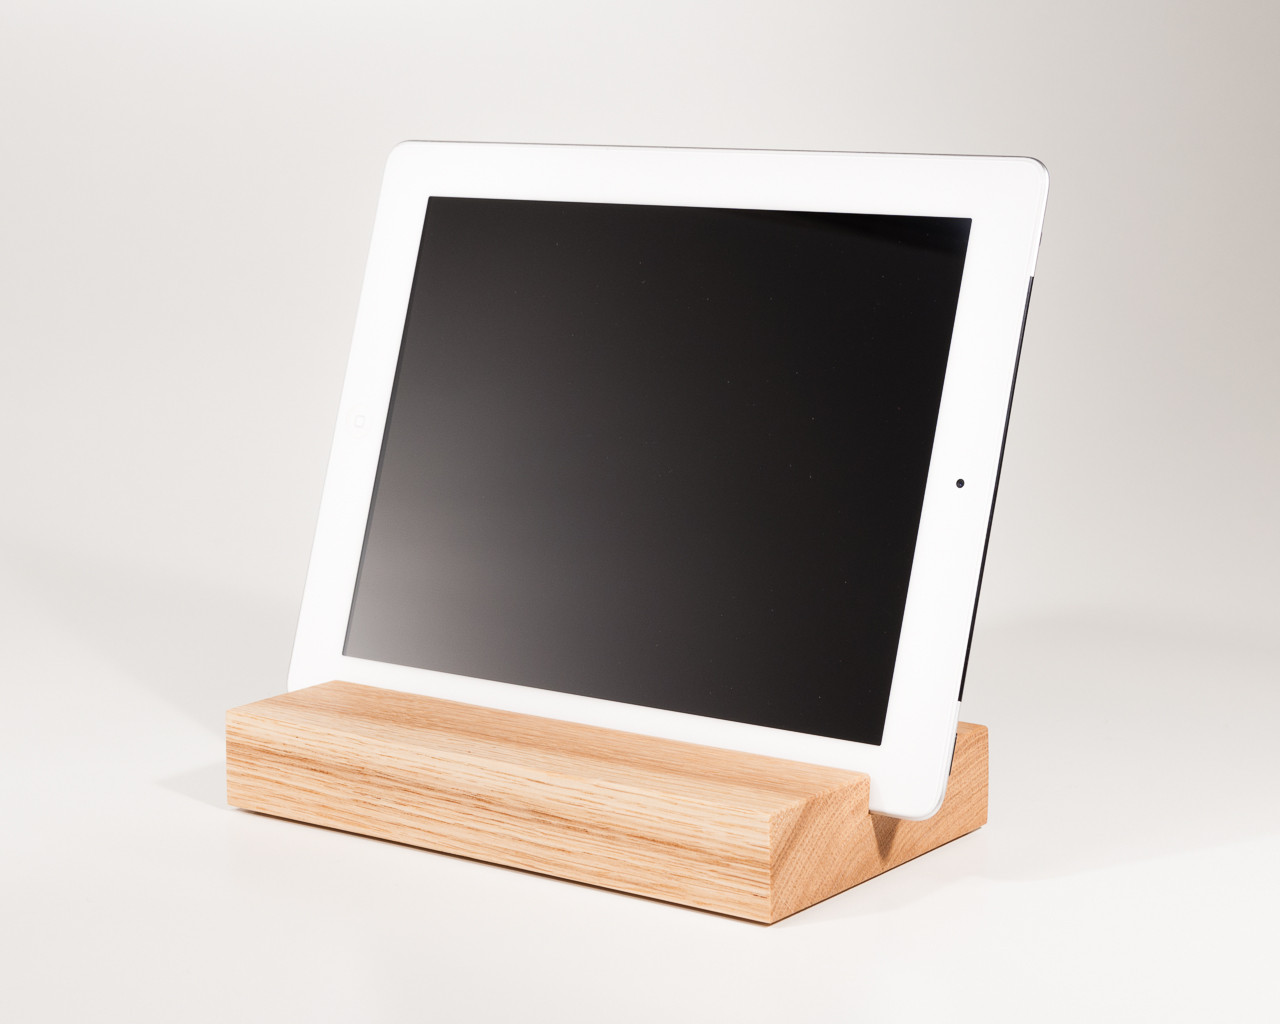 ipad halterung k che ikea tablet halter k che ikea. Black Bedroom Furniture Sets. Home Design Ideas